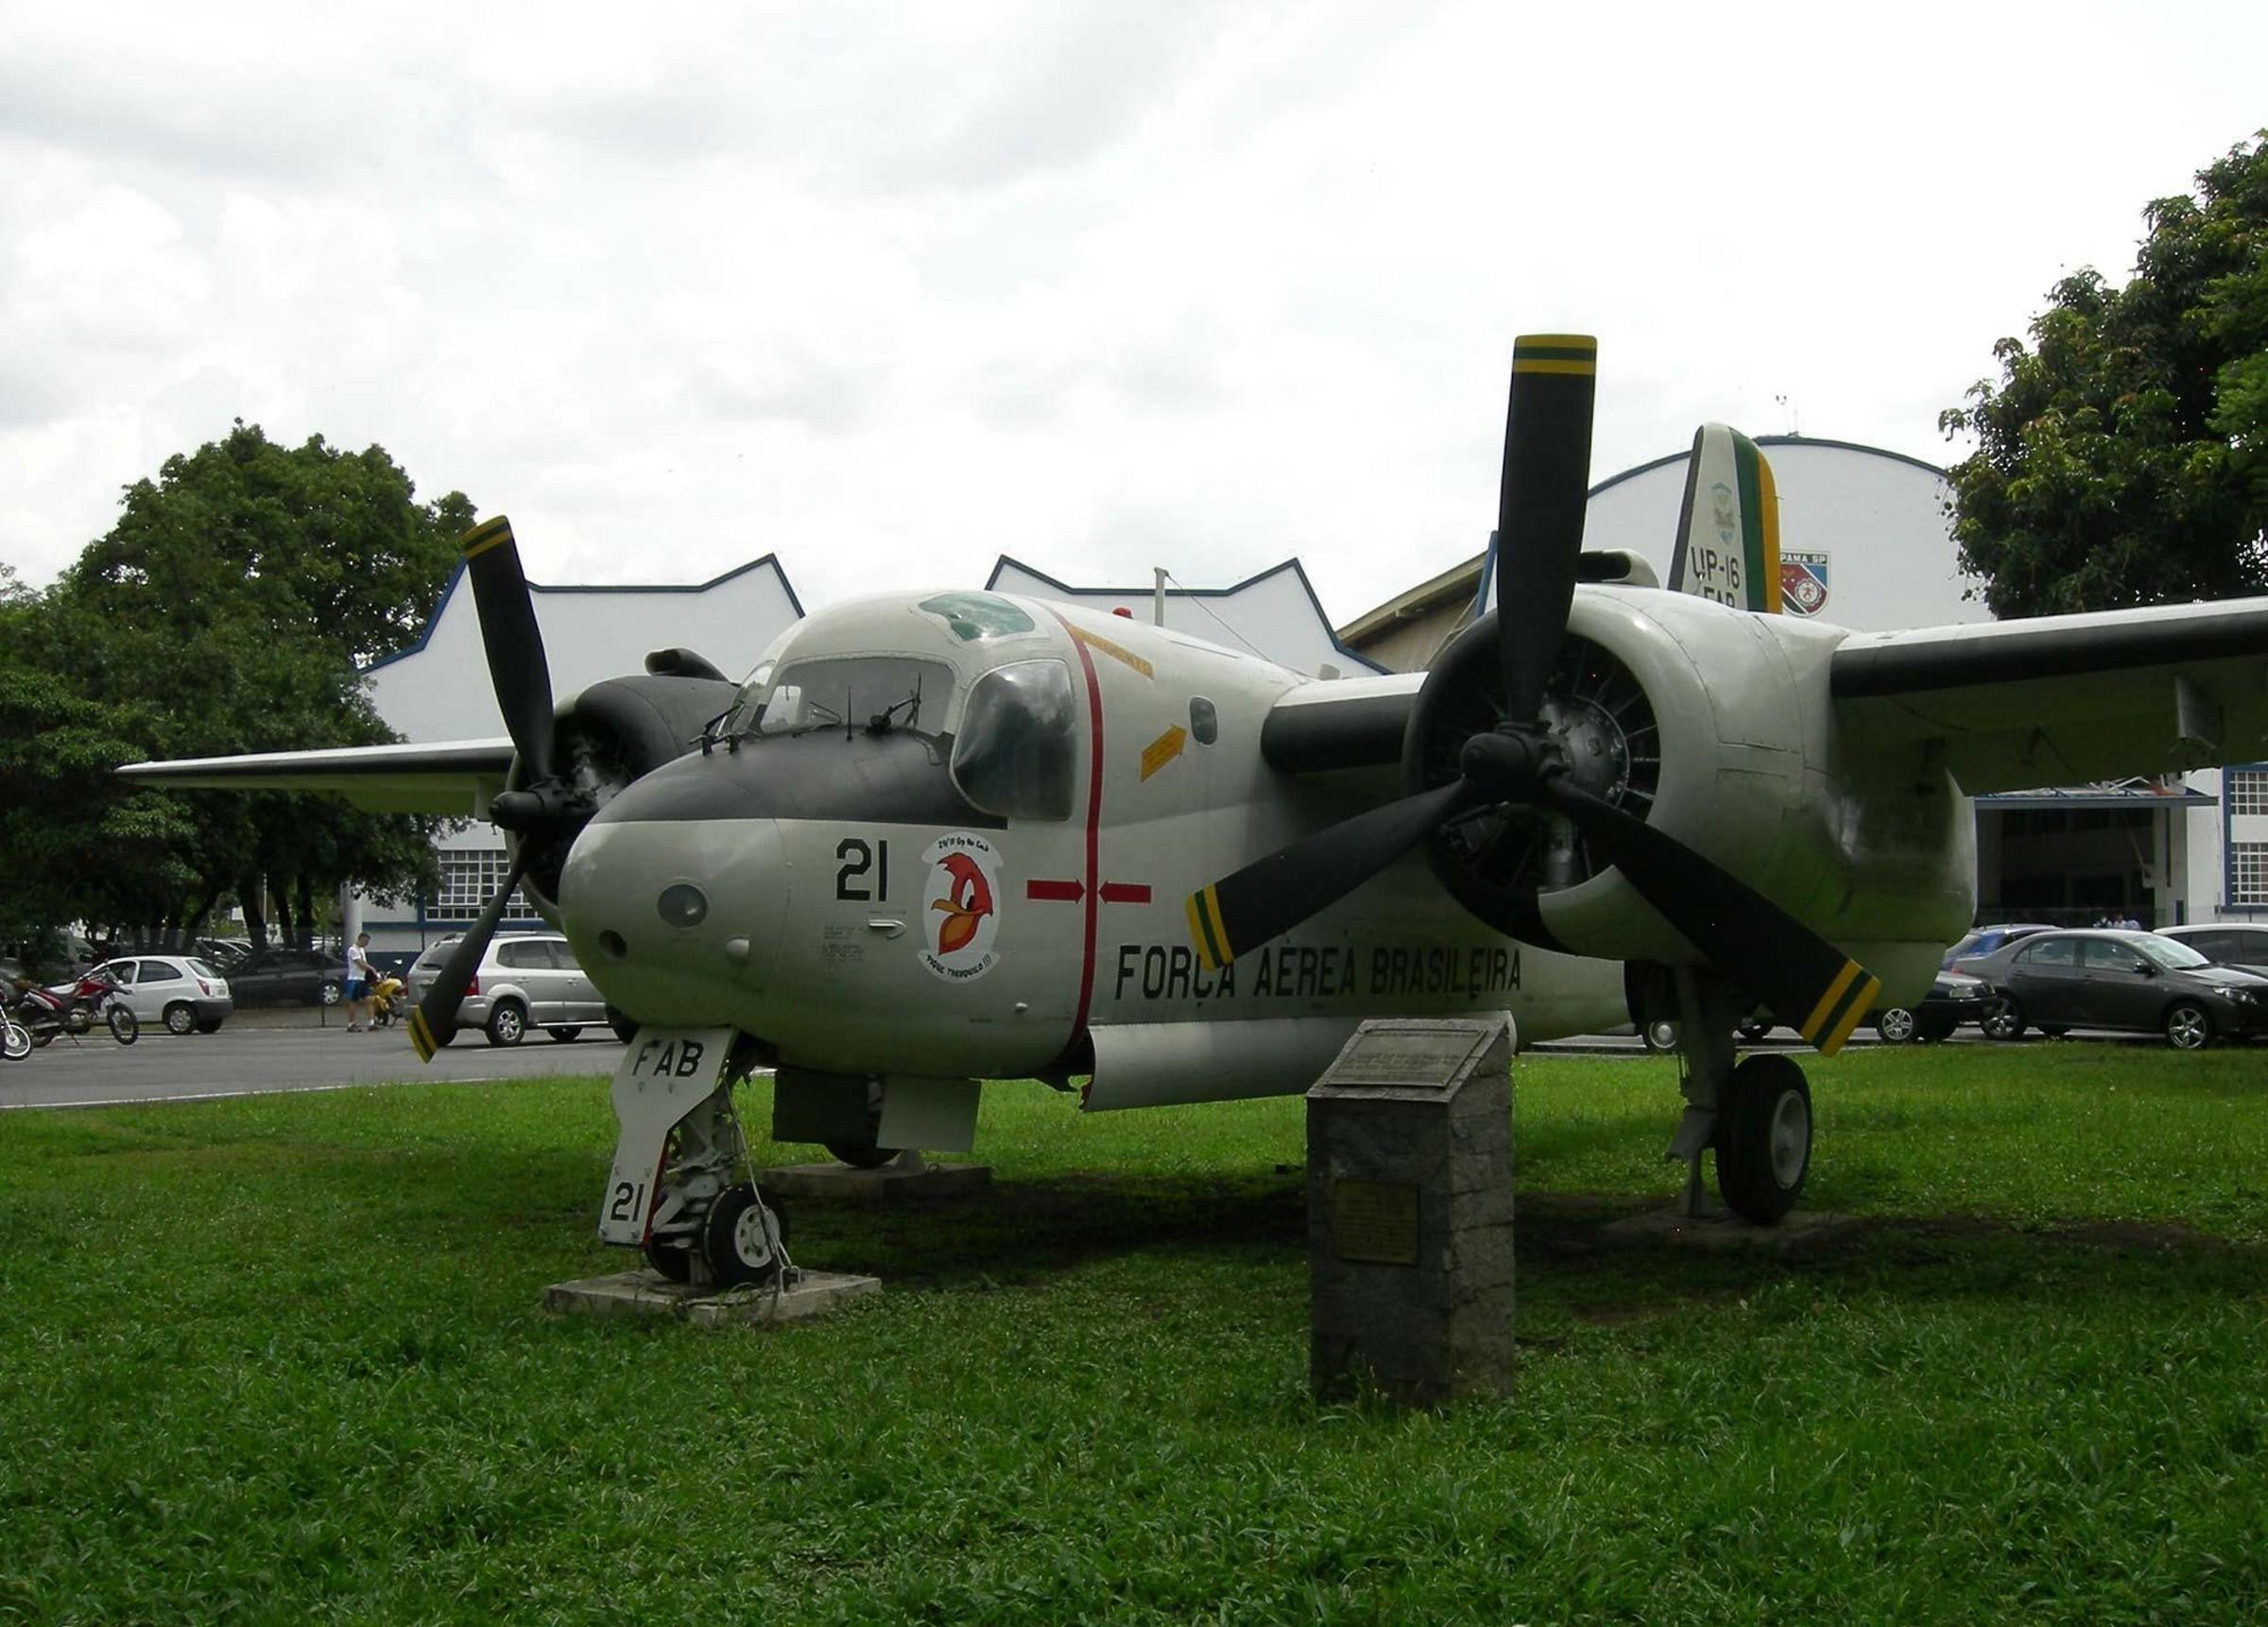 Grumman S-2 тракер